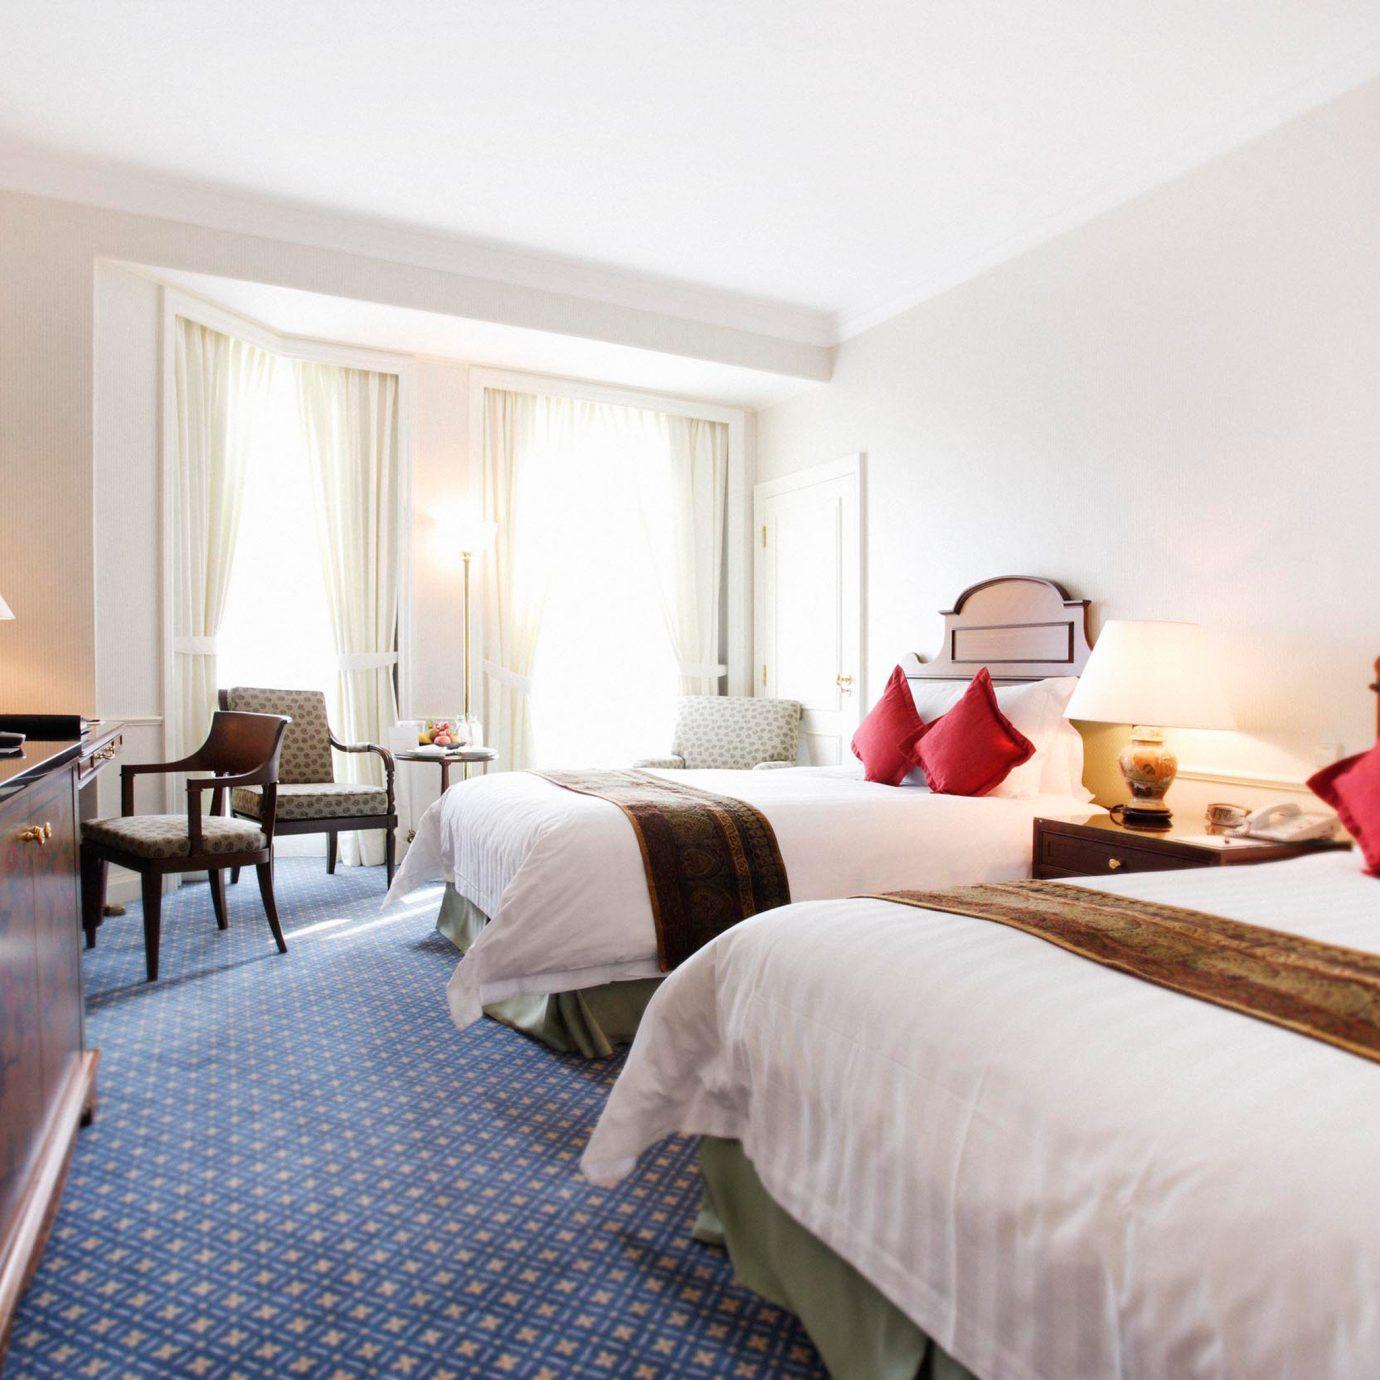 Bedroom Luxury Modern Romantic Suite property cottage Resort Villa lamp